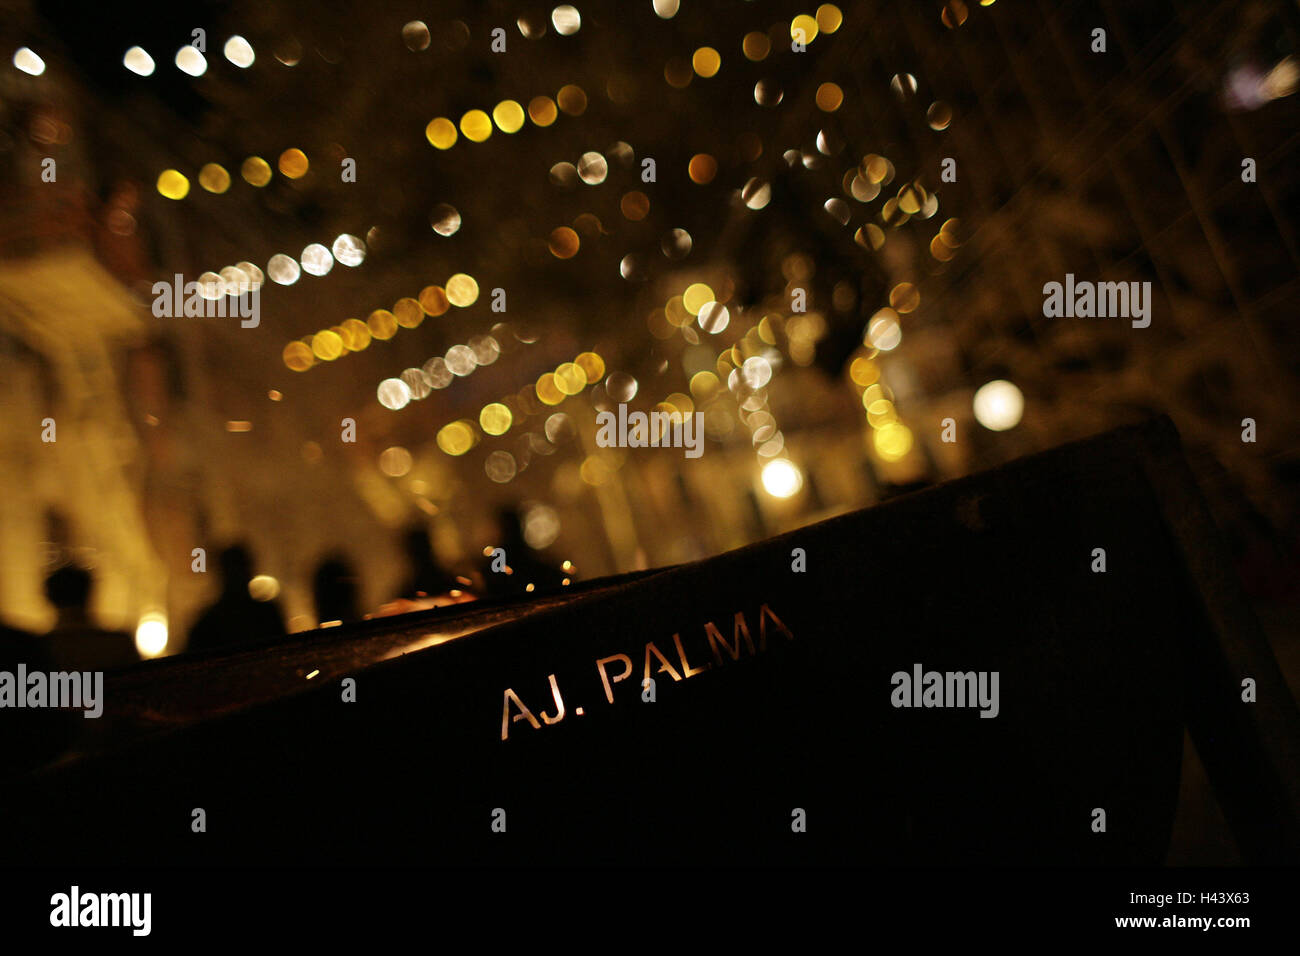 Spain, island Majorca, Palma, night, fireworks, the Balearic Islands, island, Majorca, lights, glitters, dots, people, Stock Photo